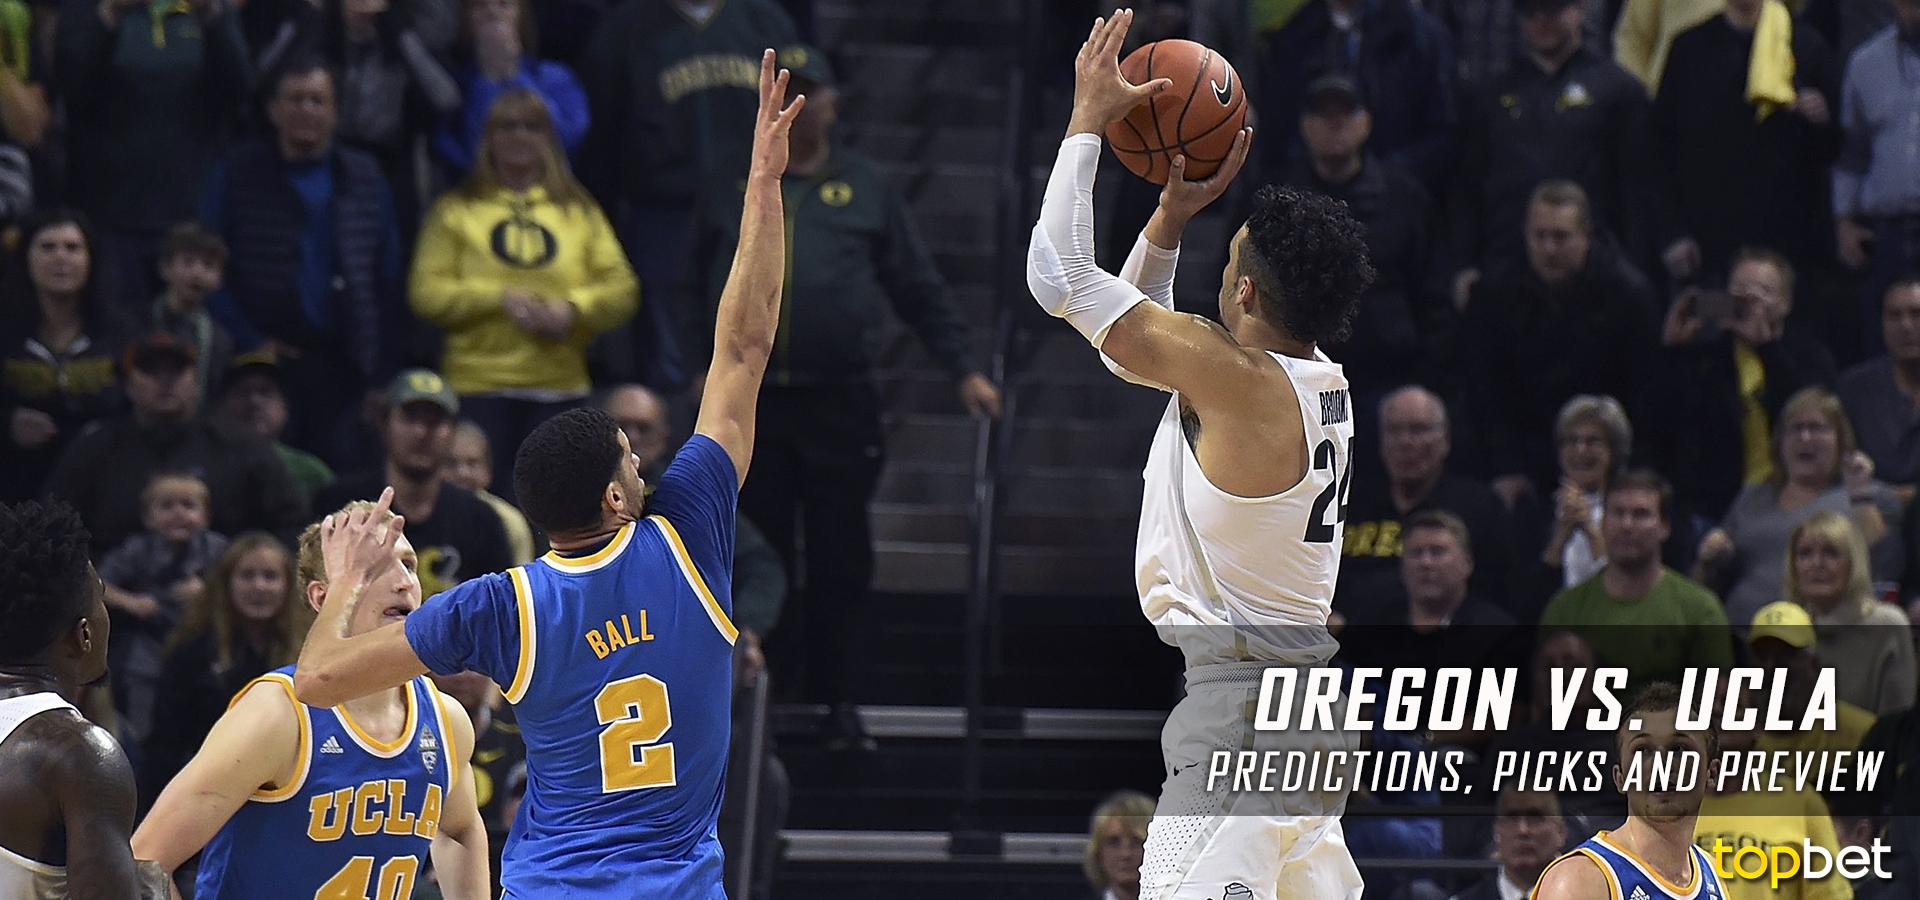 Oregon Vs Ucla Basketball Predictions Picks Odds Preview